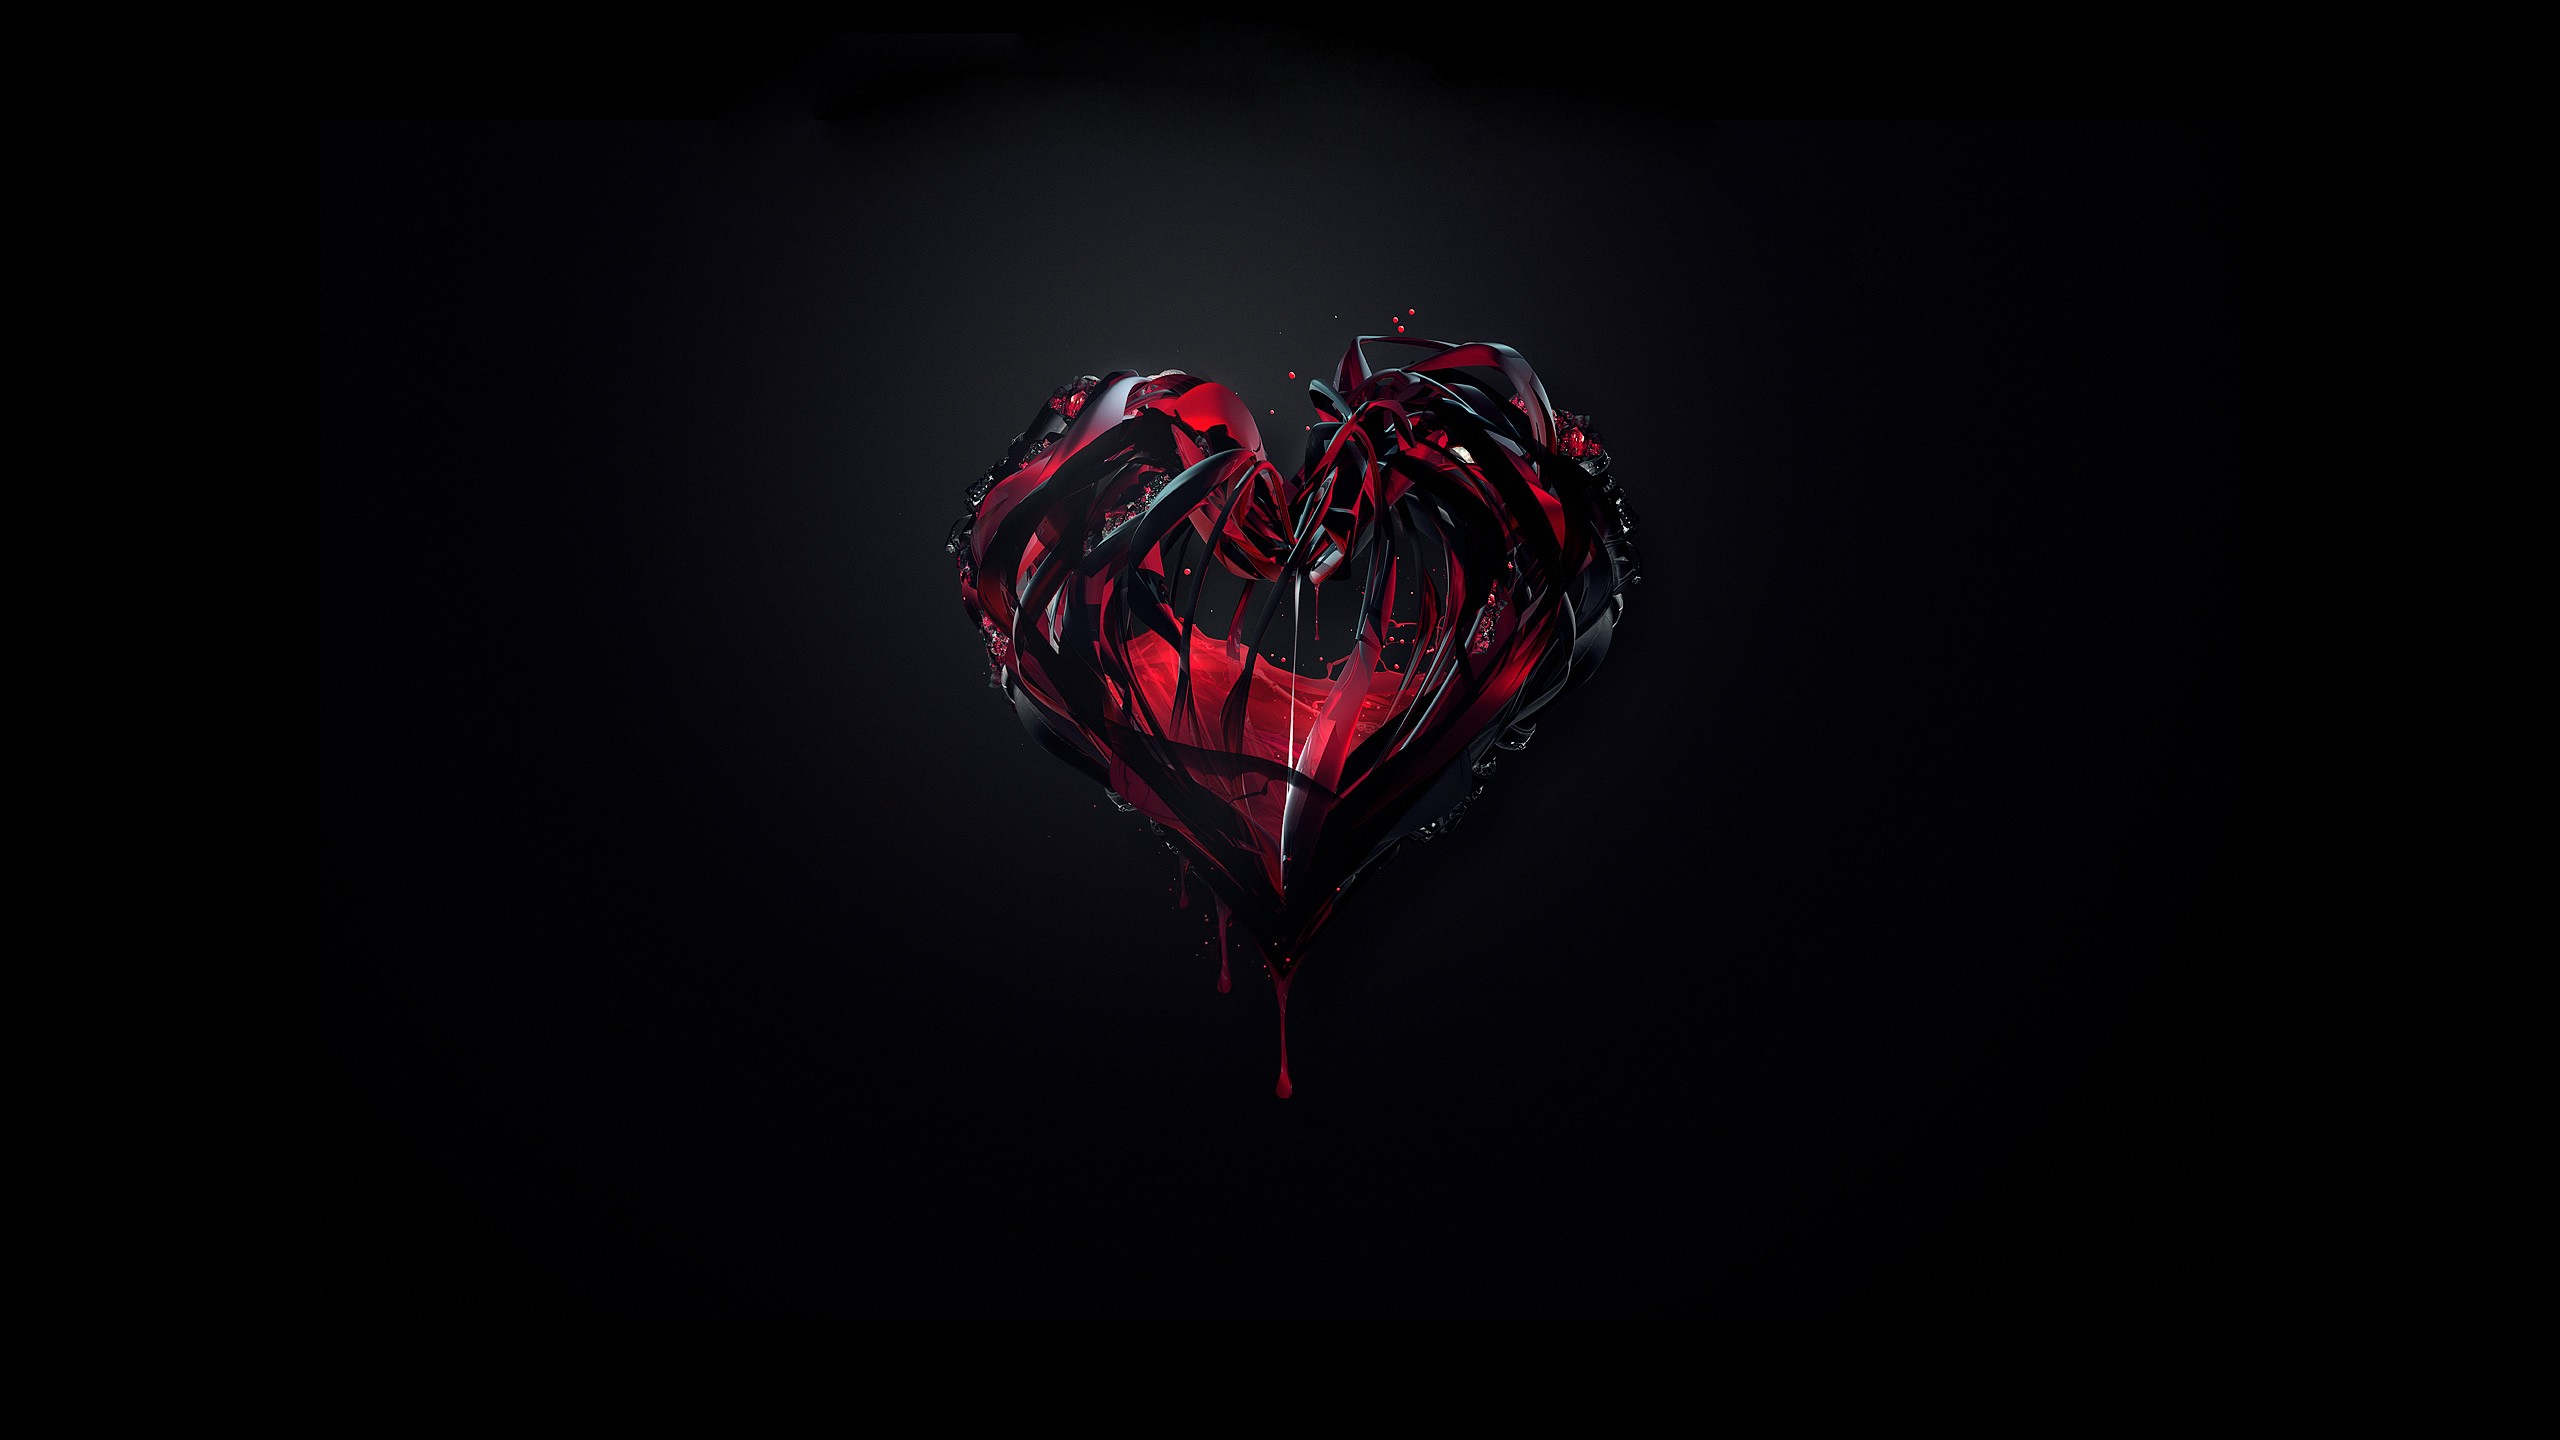 Love Black Wallpaper 2560x1440 Love Black Hearts 2560x1440